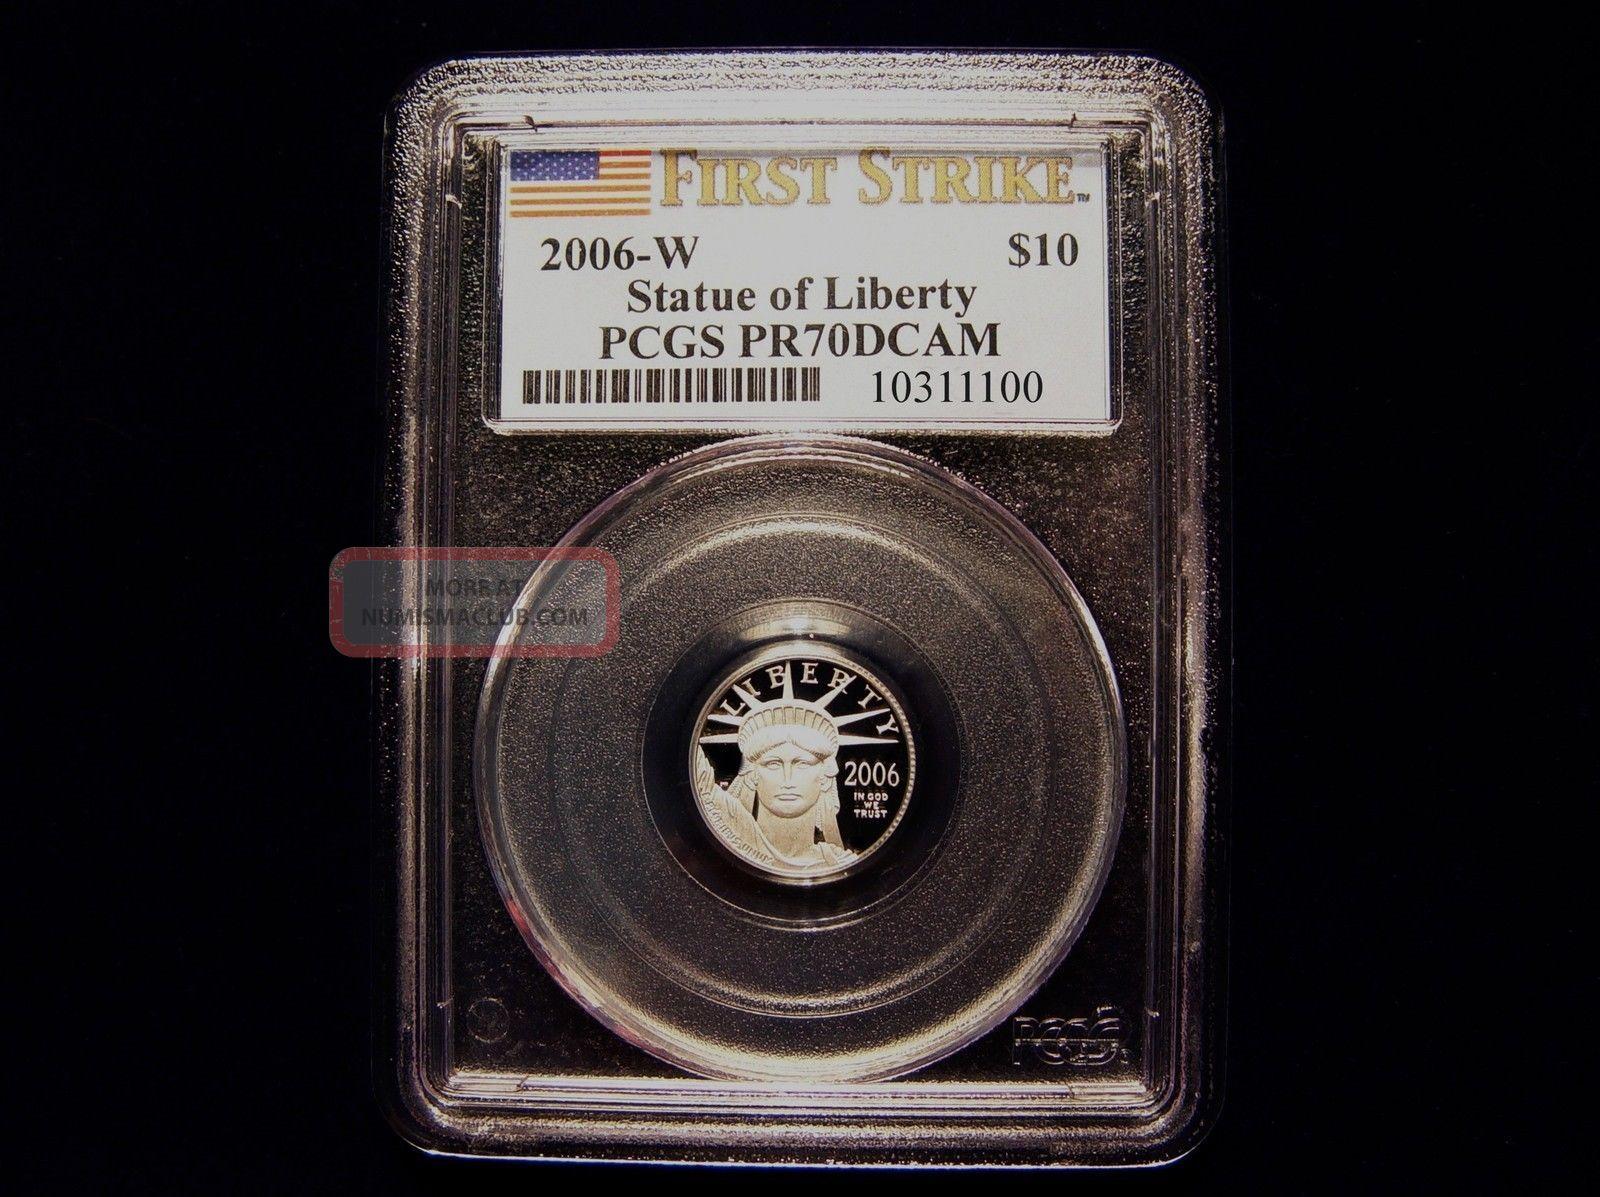 2006 W Pcgs Pr70dcam $10 First Strike Designated Proof Platinum Eagle Pop 38 Platinum photo